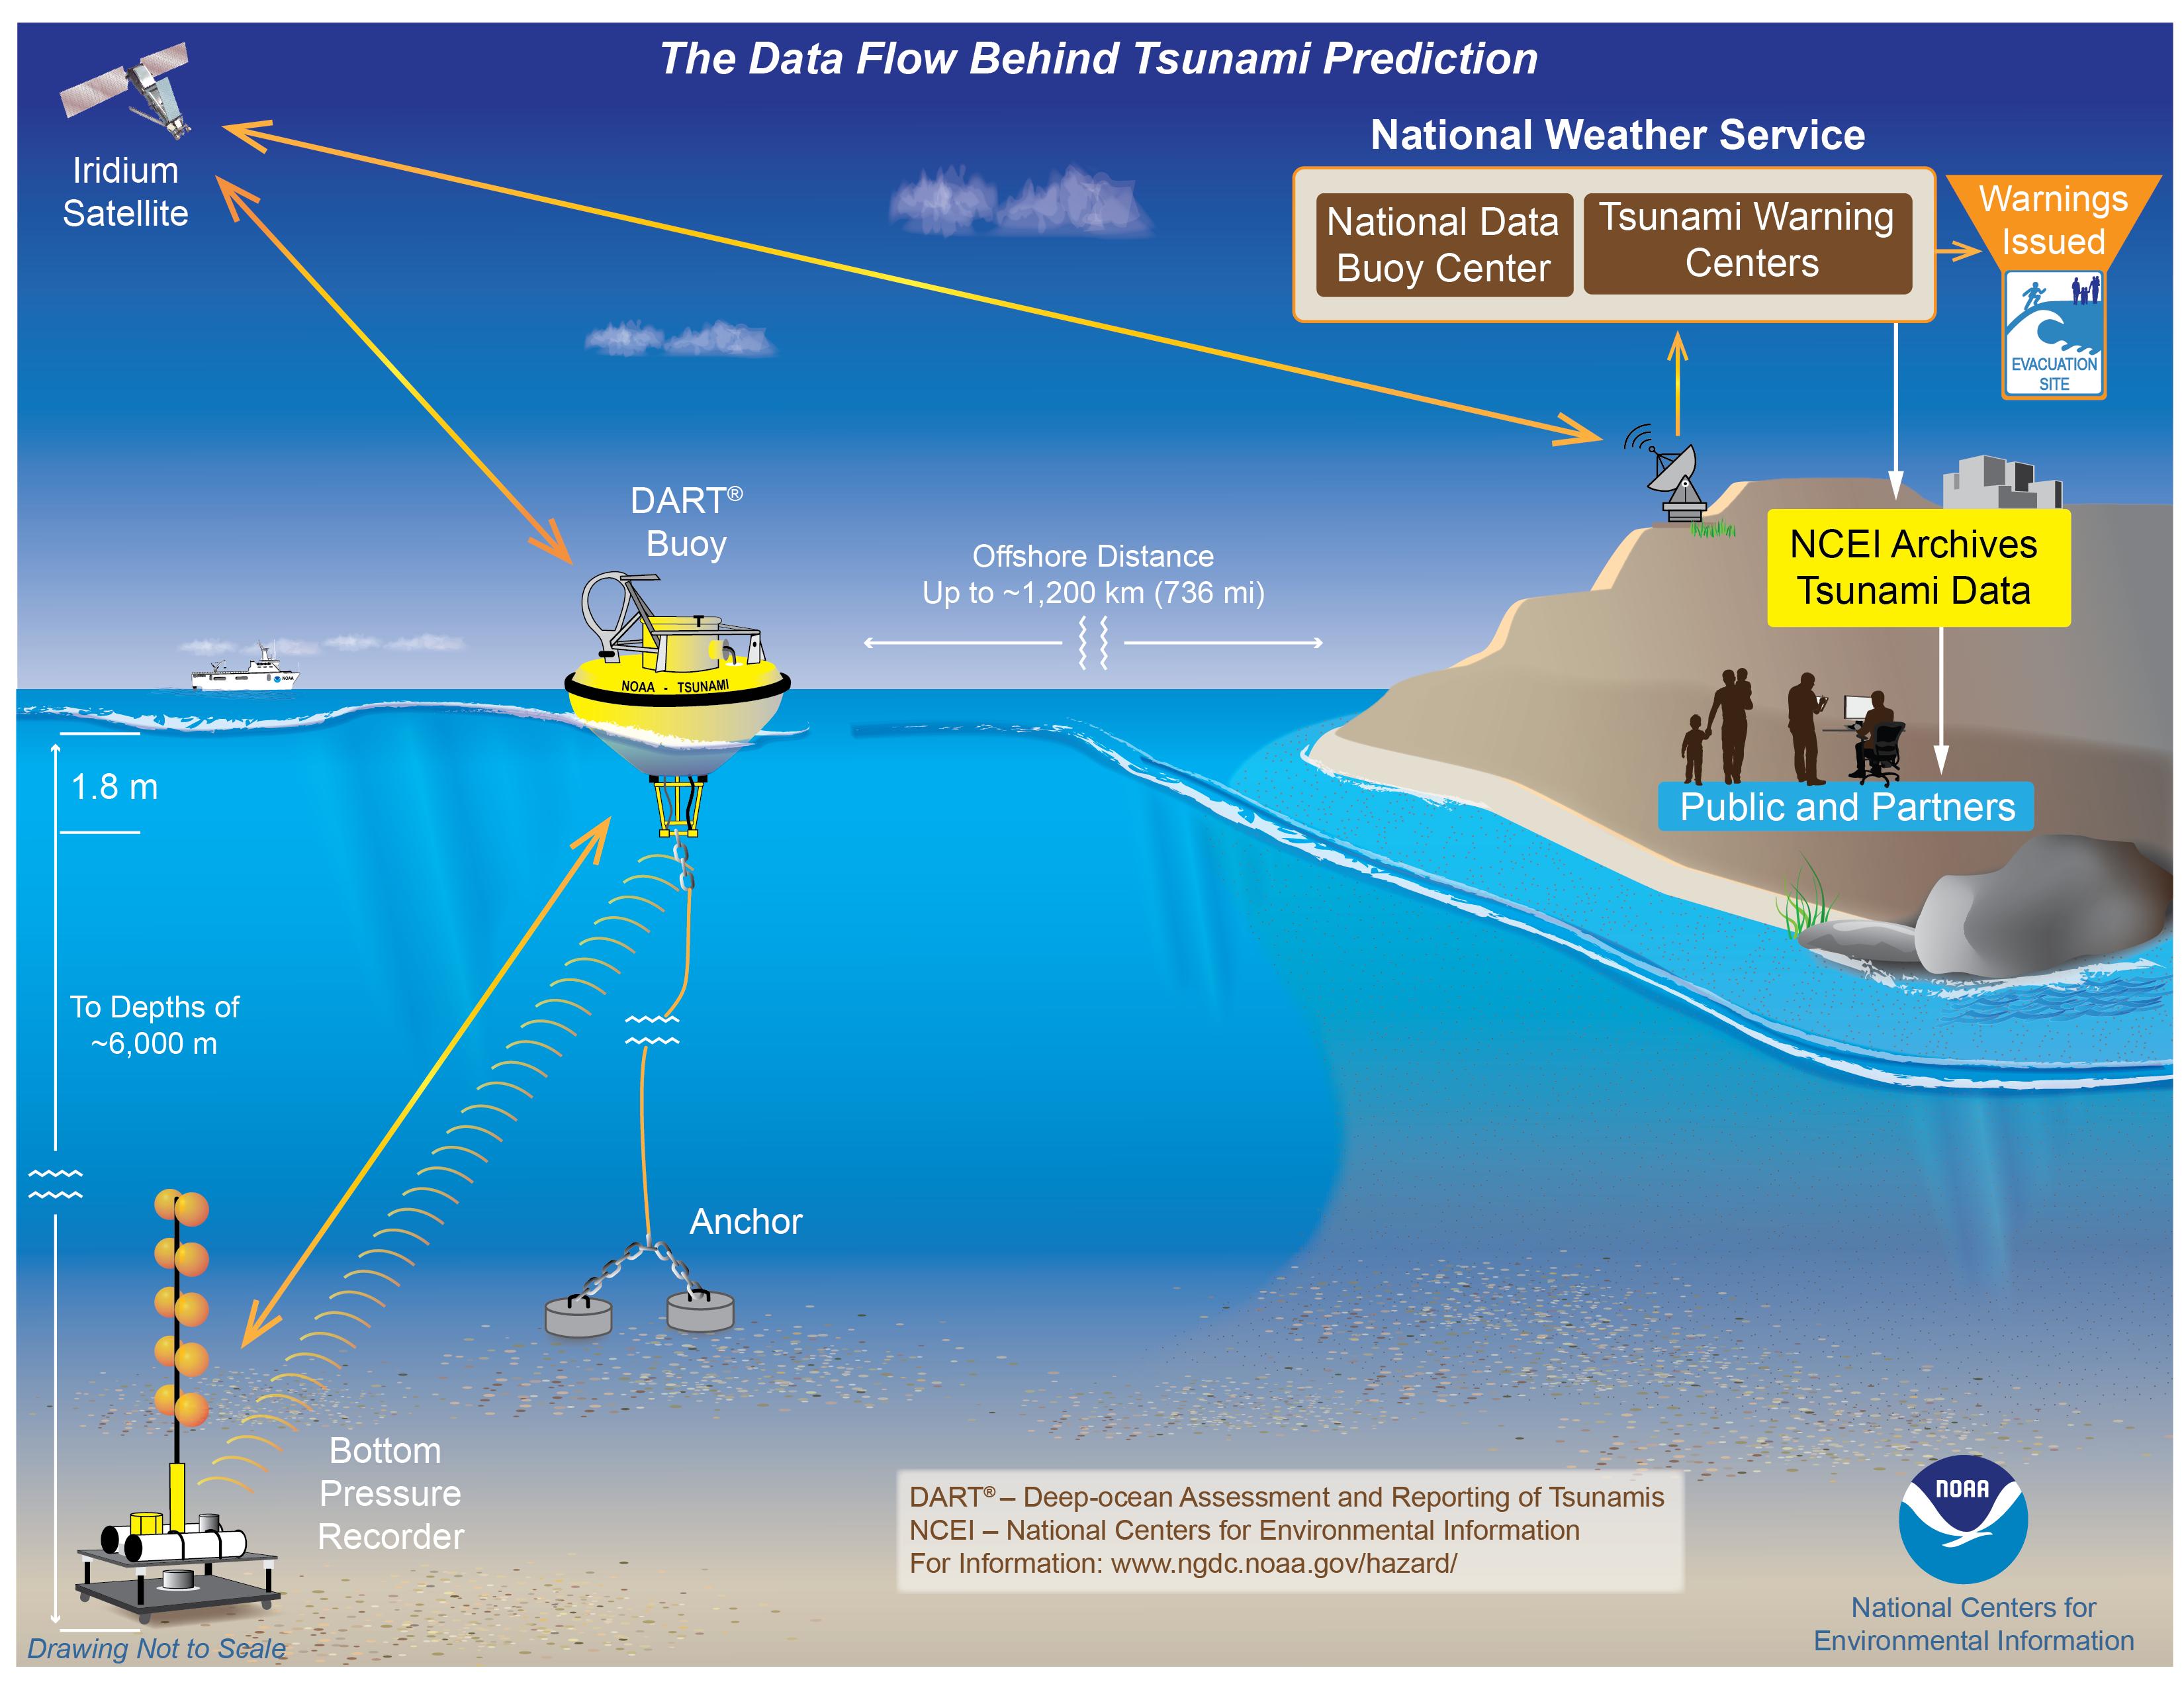 Image of DART buoy data flow for tsunami preparedness NCEI